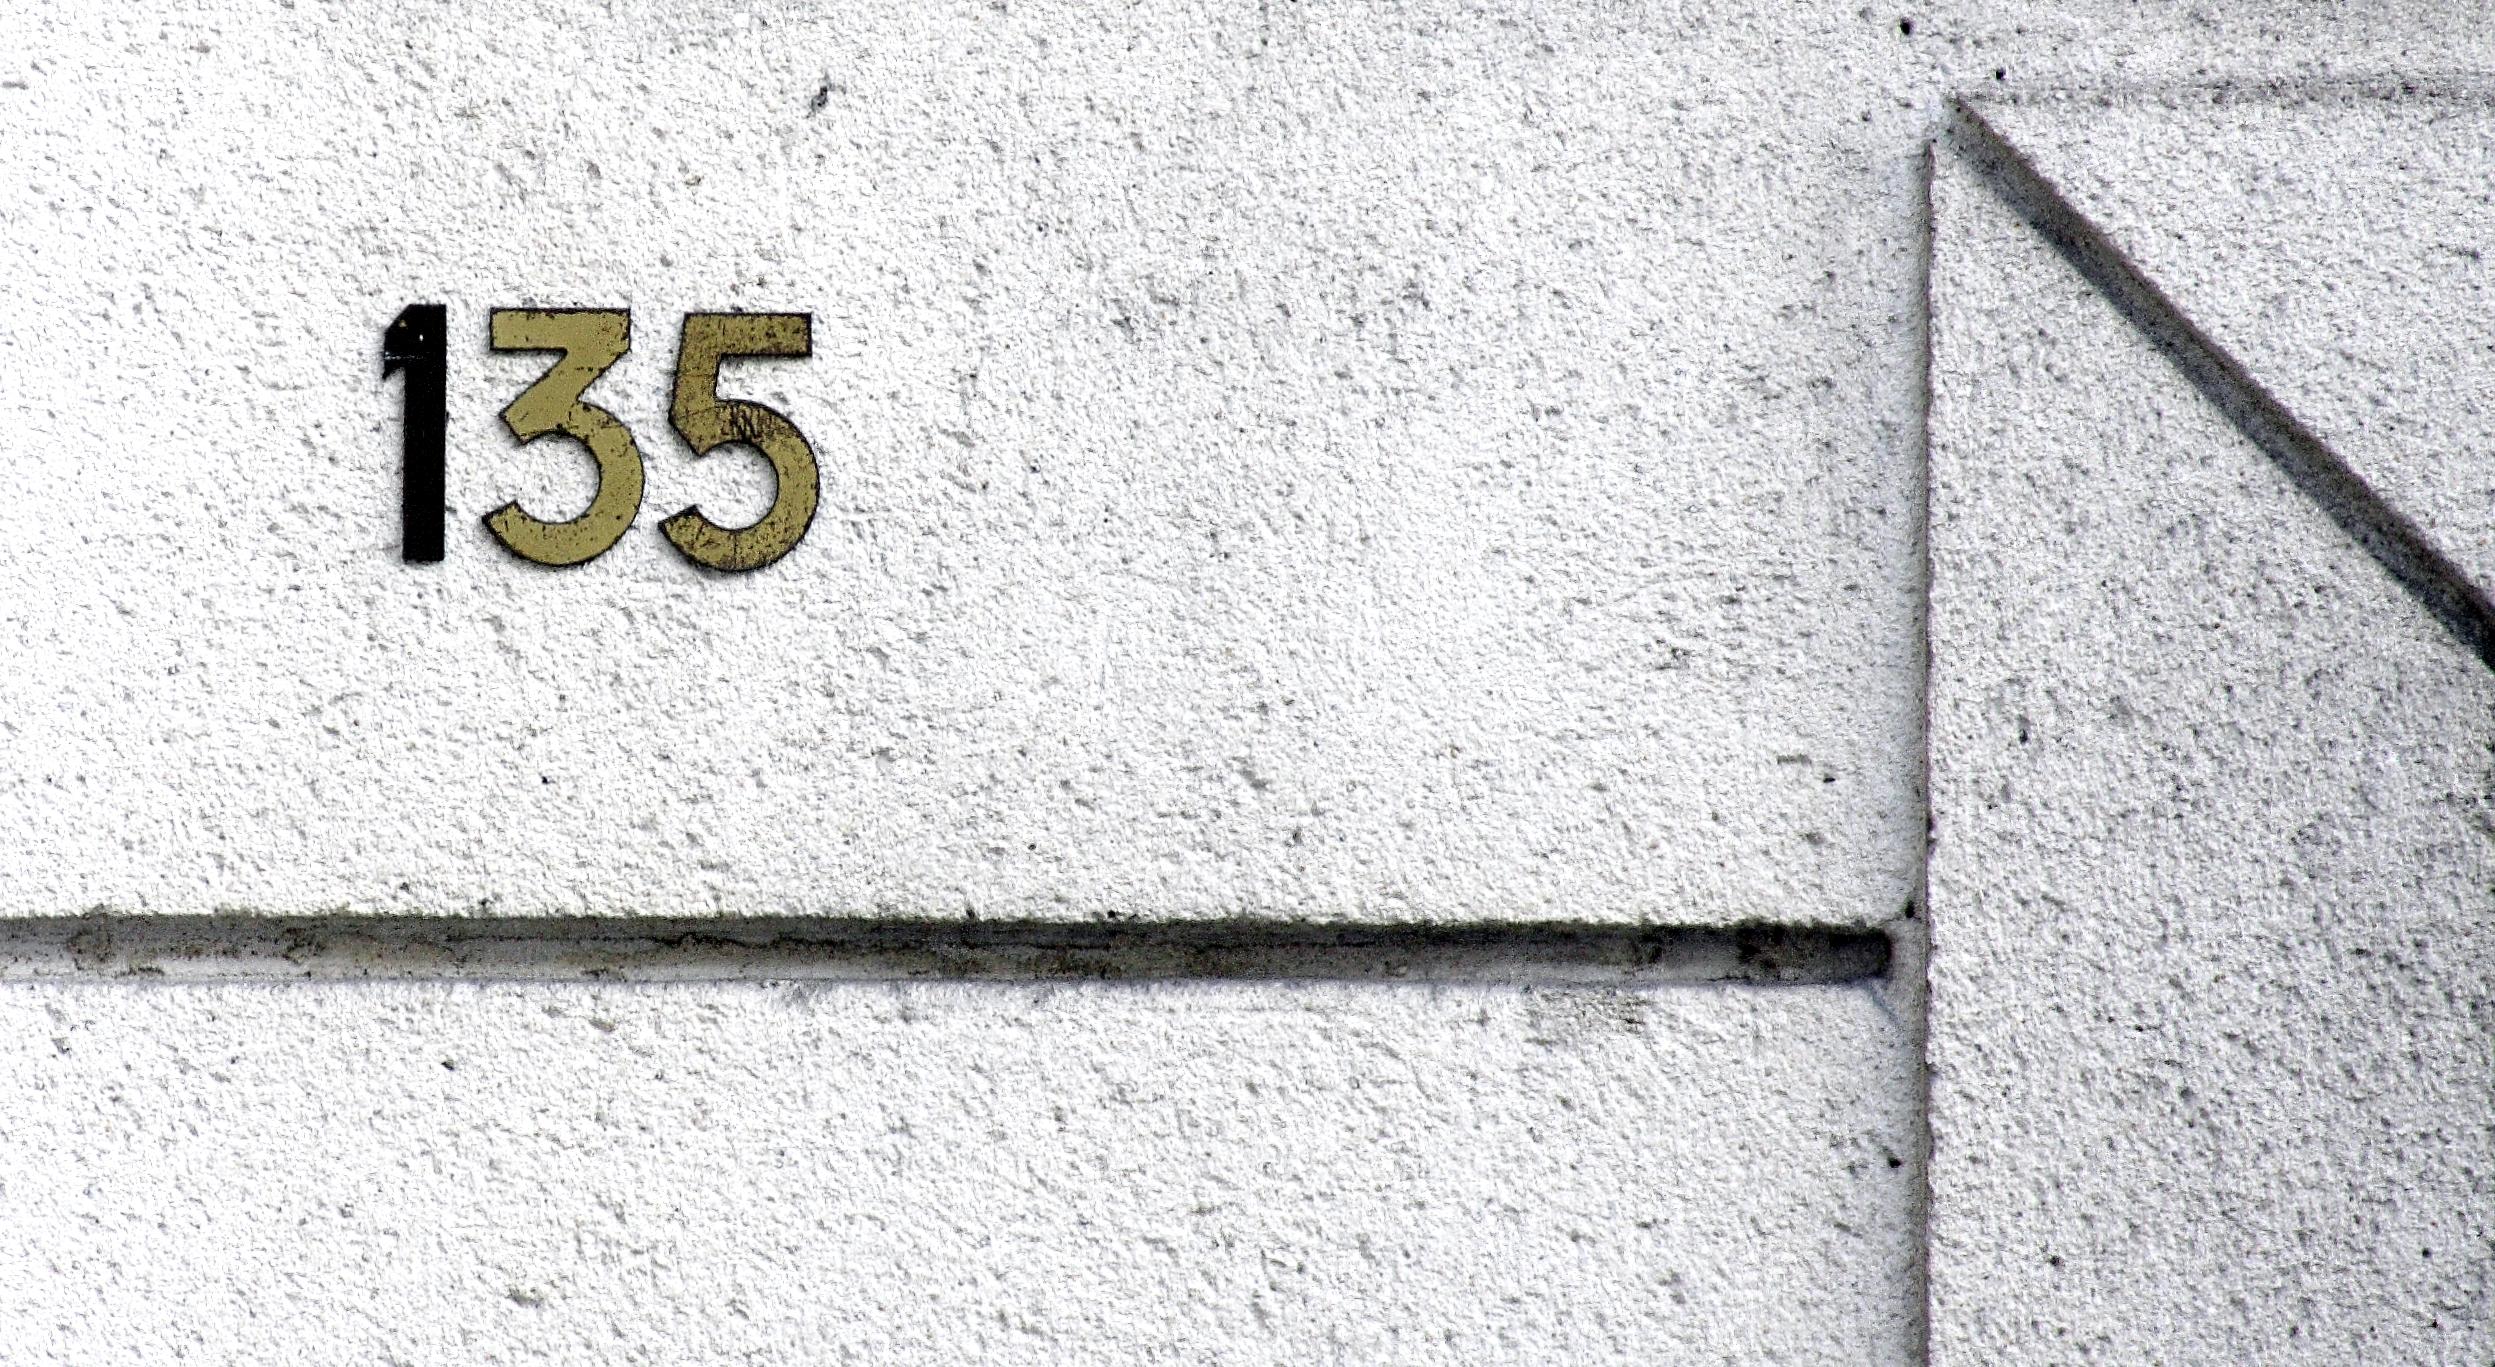 File:Numéro 135, Rue du Château jpg - Wikimedia Commons